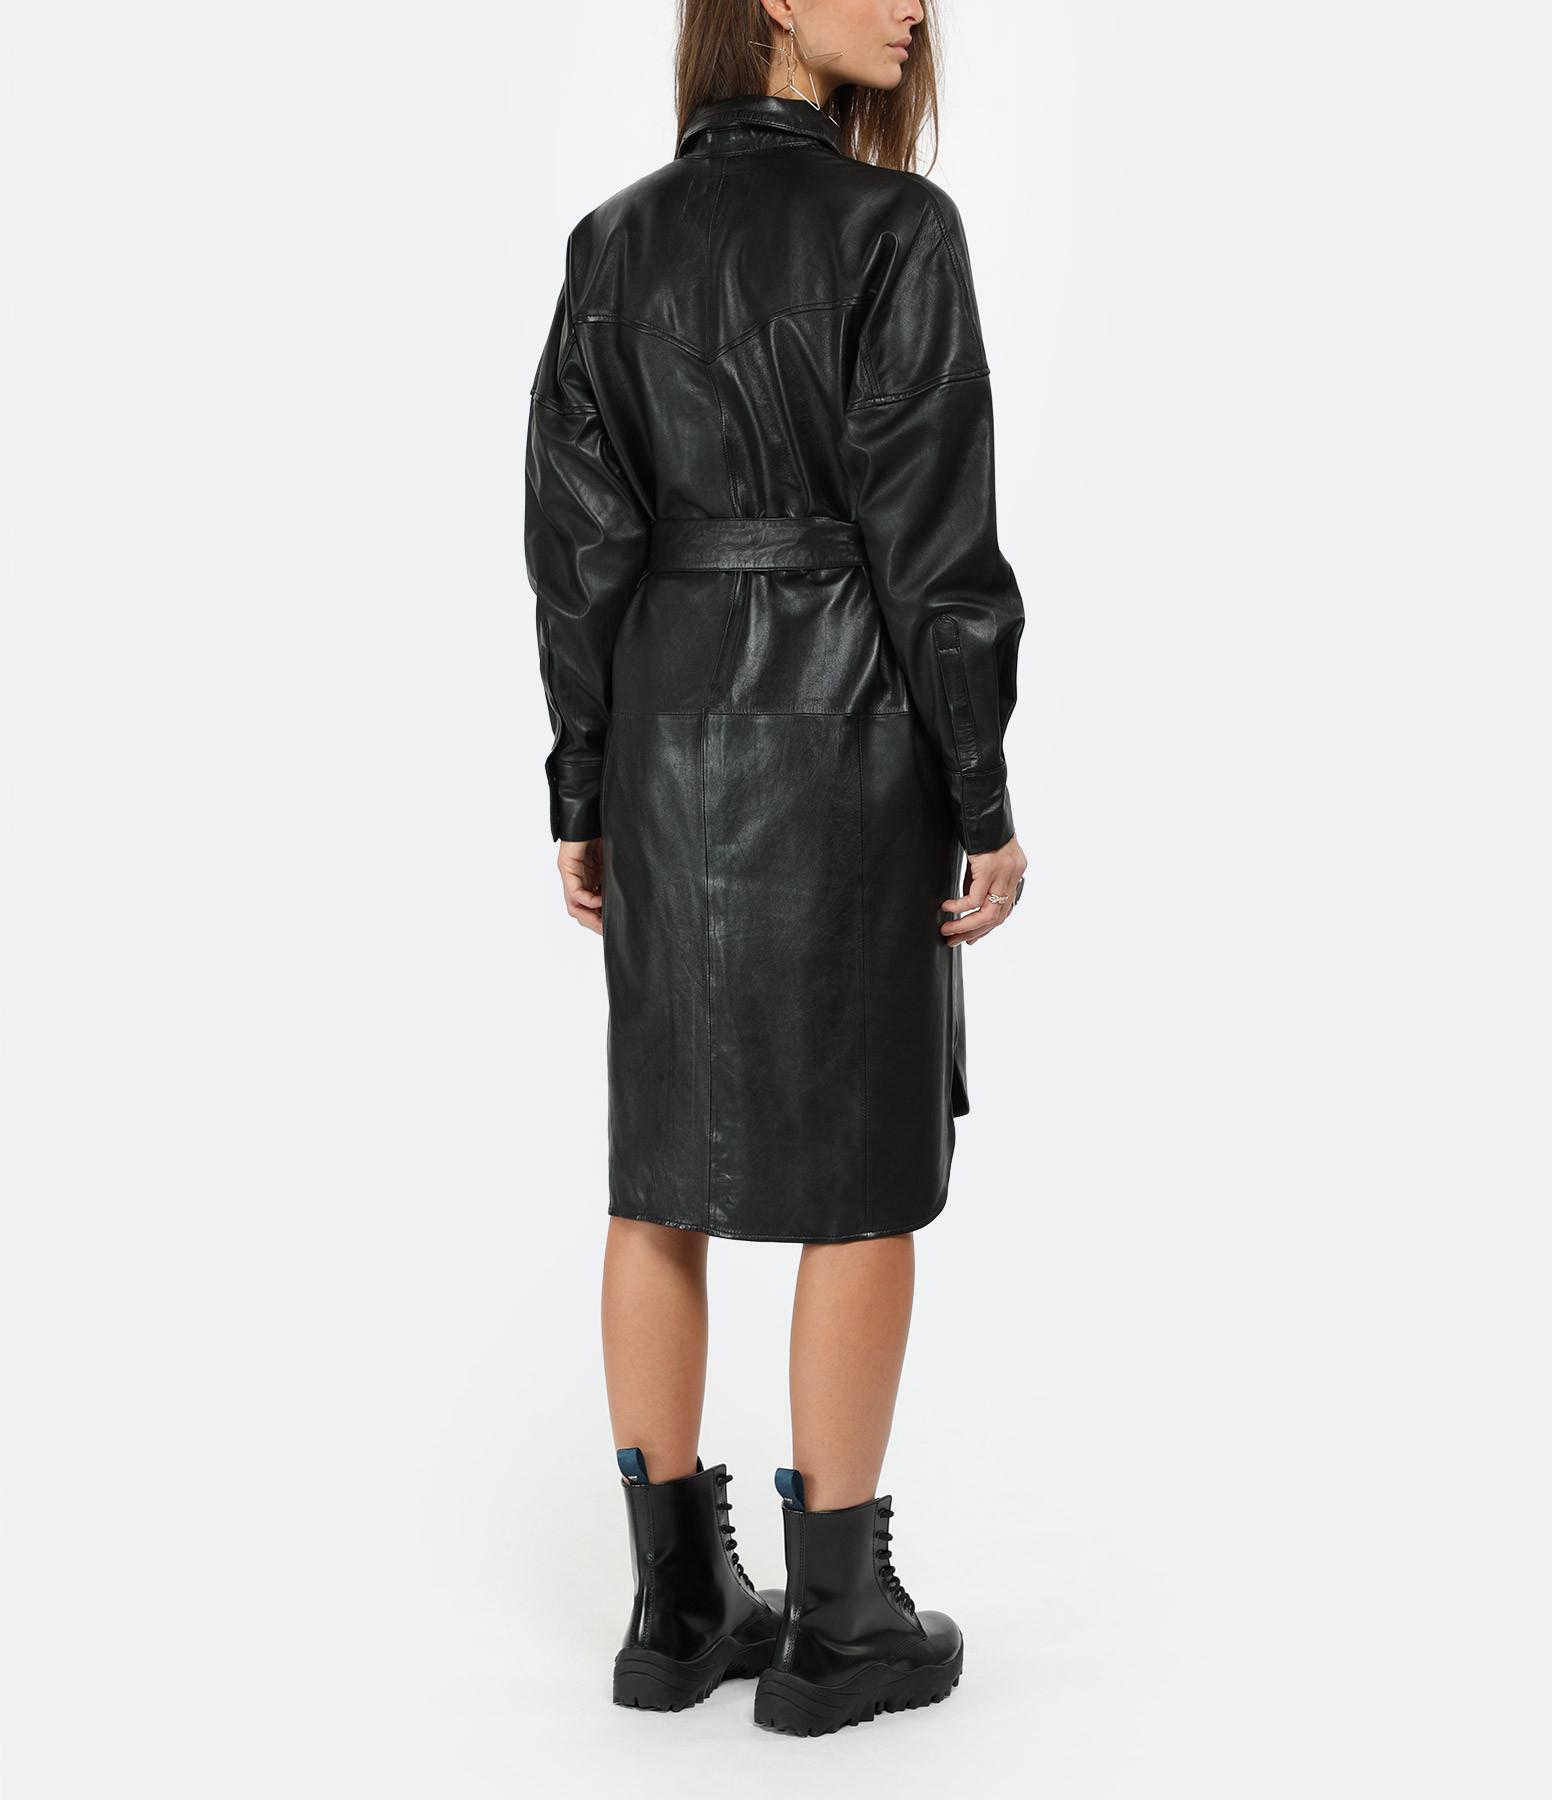 RAIINE - Robe Denton Cuir Noir